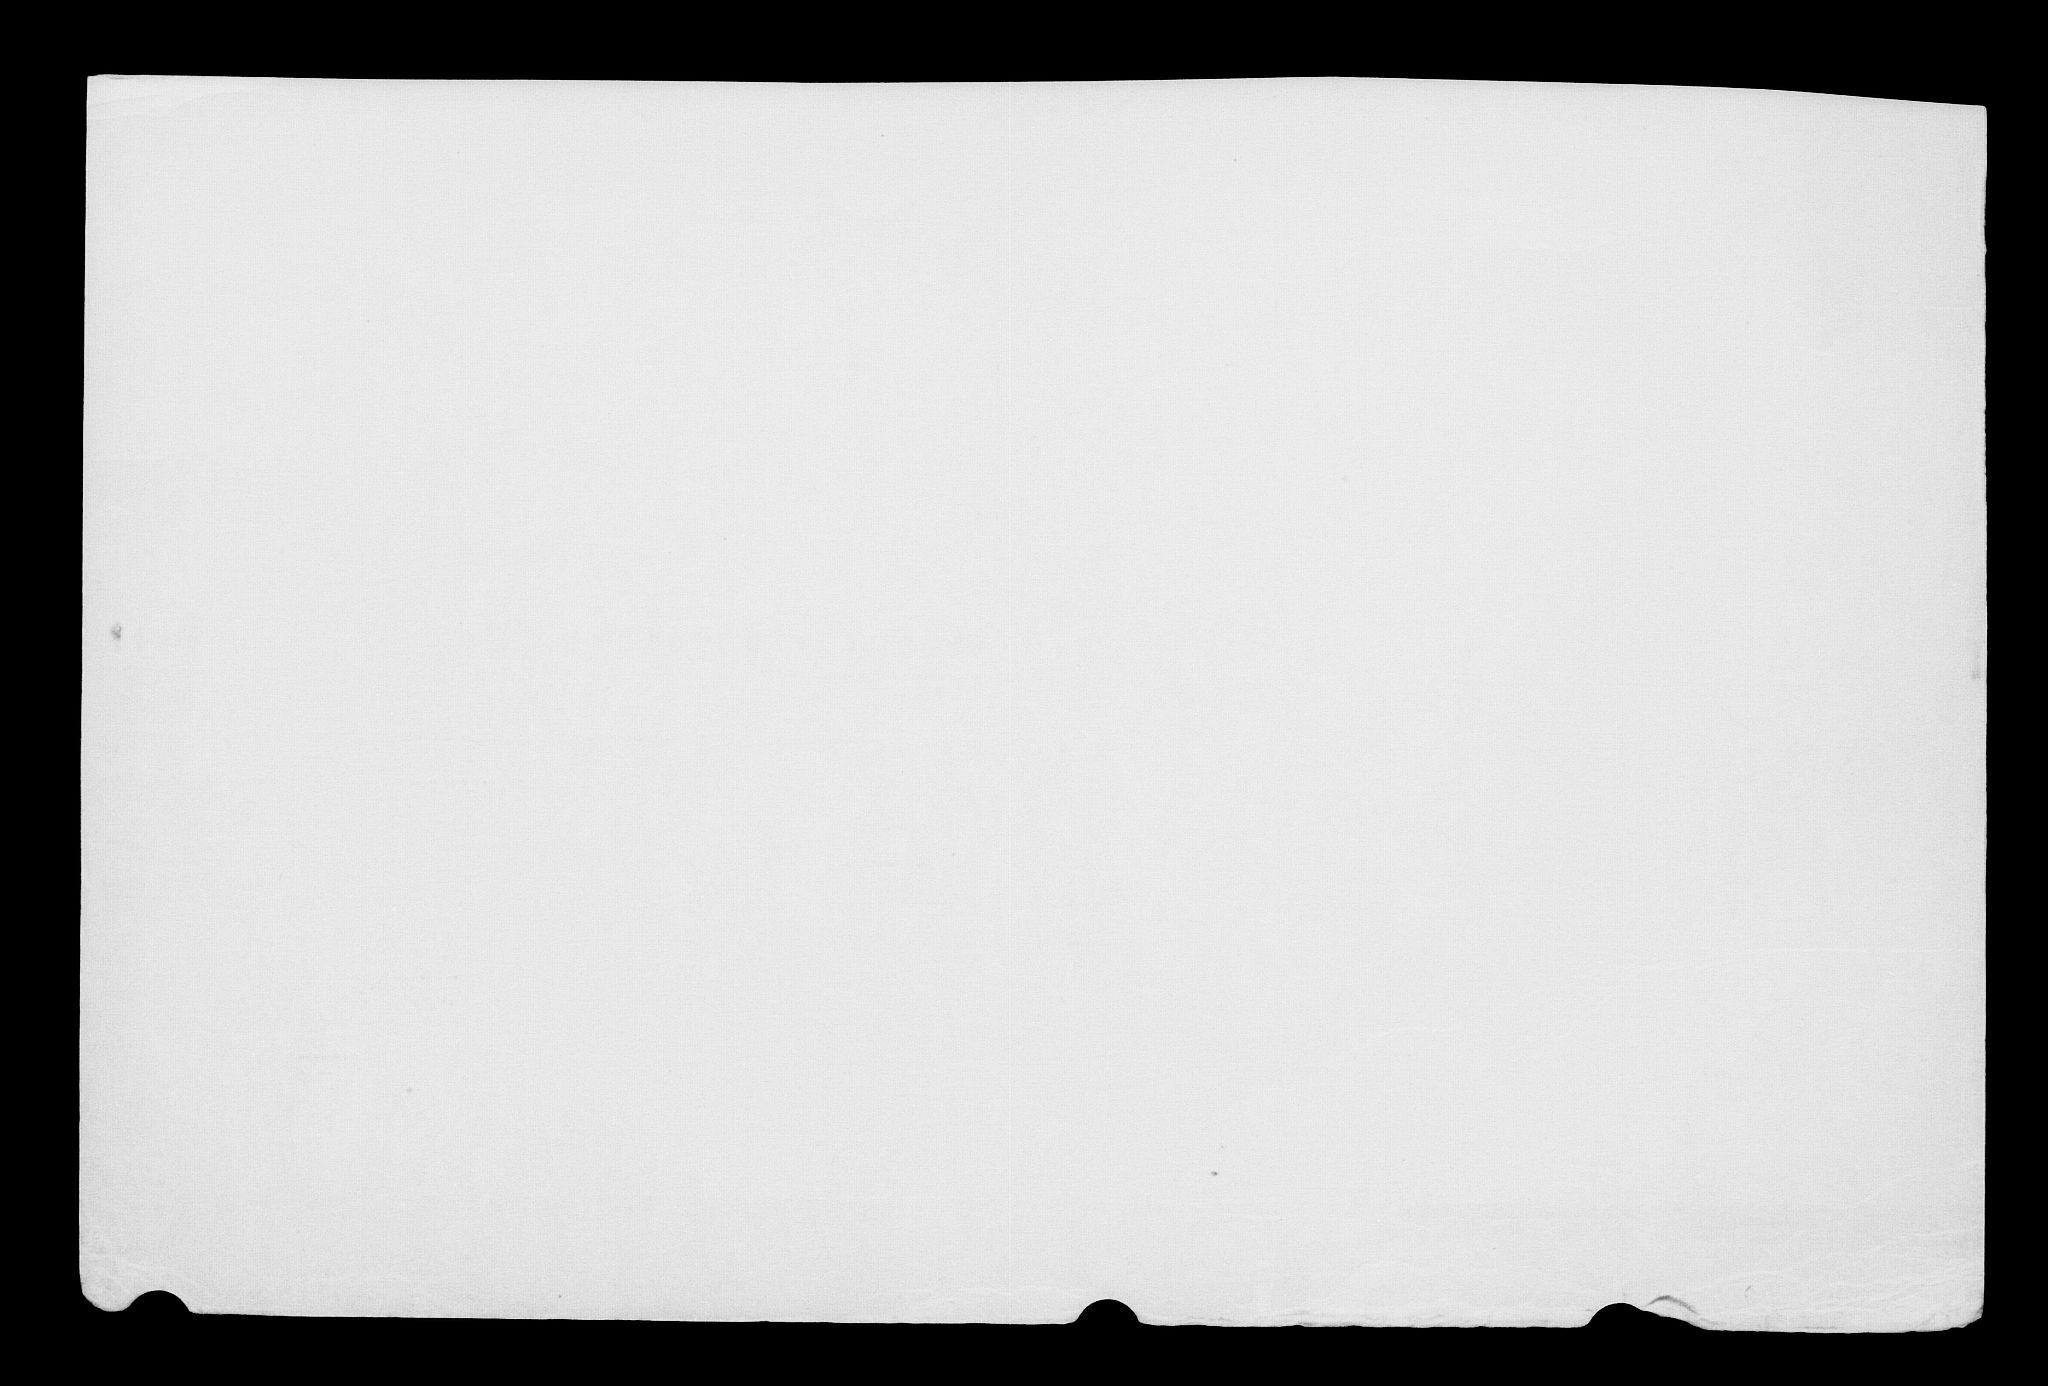 RA, Direktoratet for sjømenn, G/Gb/L0005: Hovedkort, 1888, s. 445